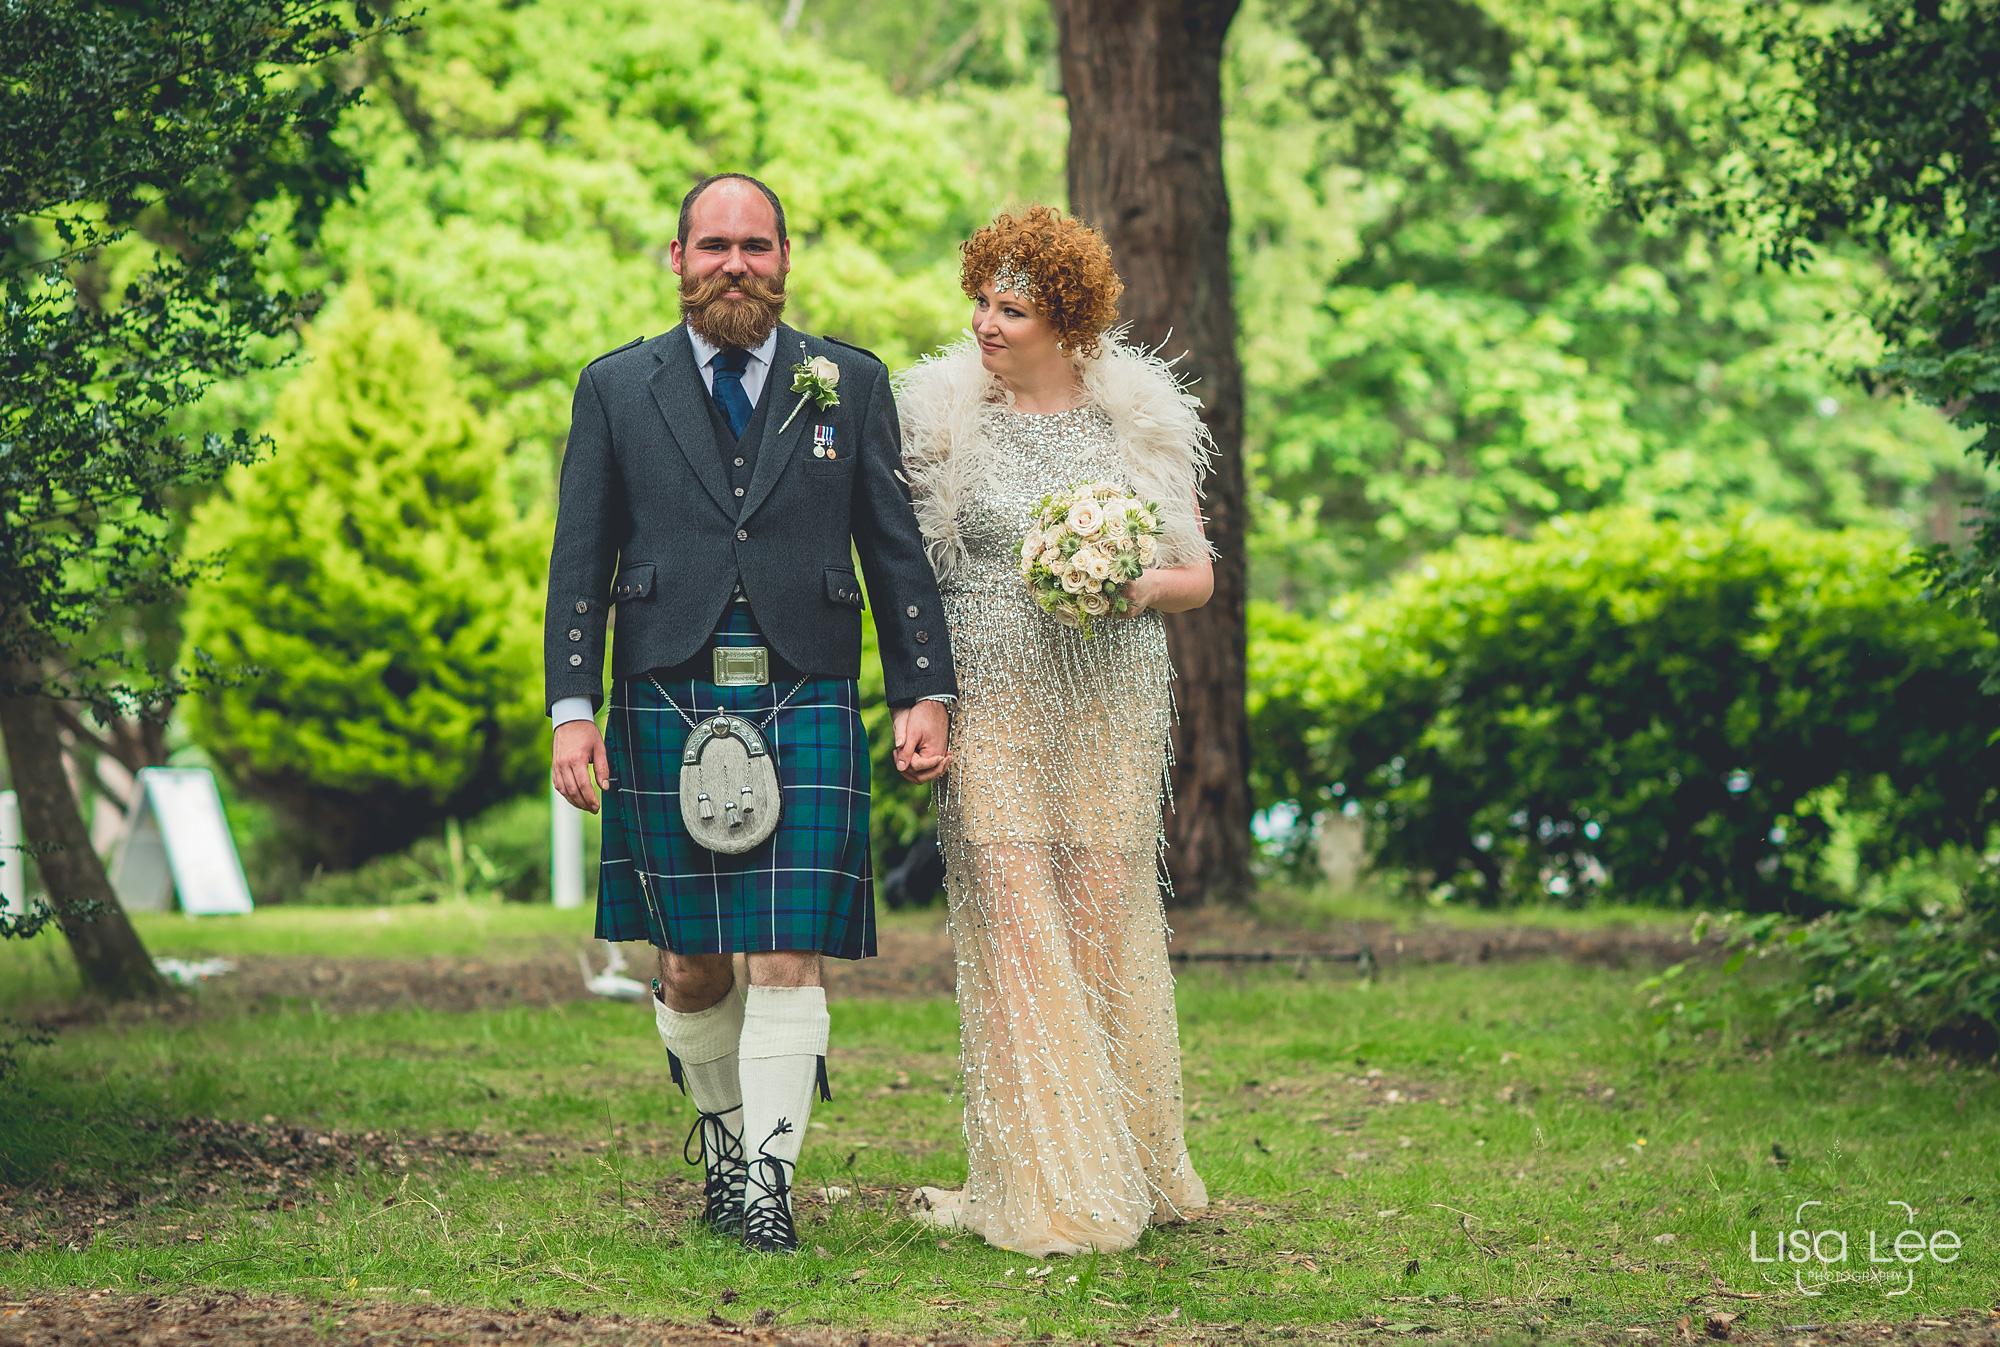 lisa-lee-wedding-photography-couple-talbot-heath-1.jpg